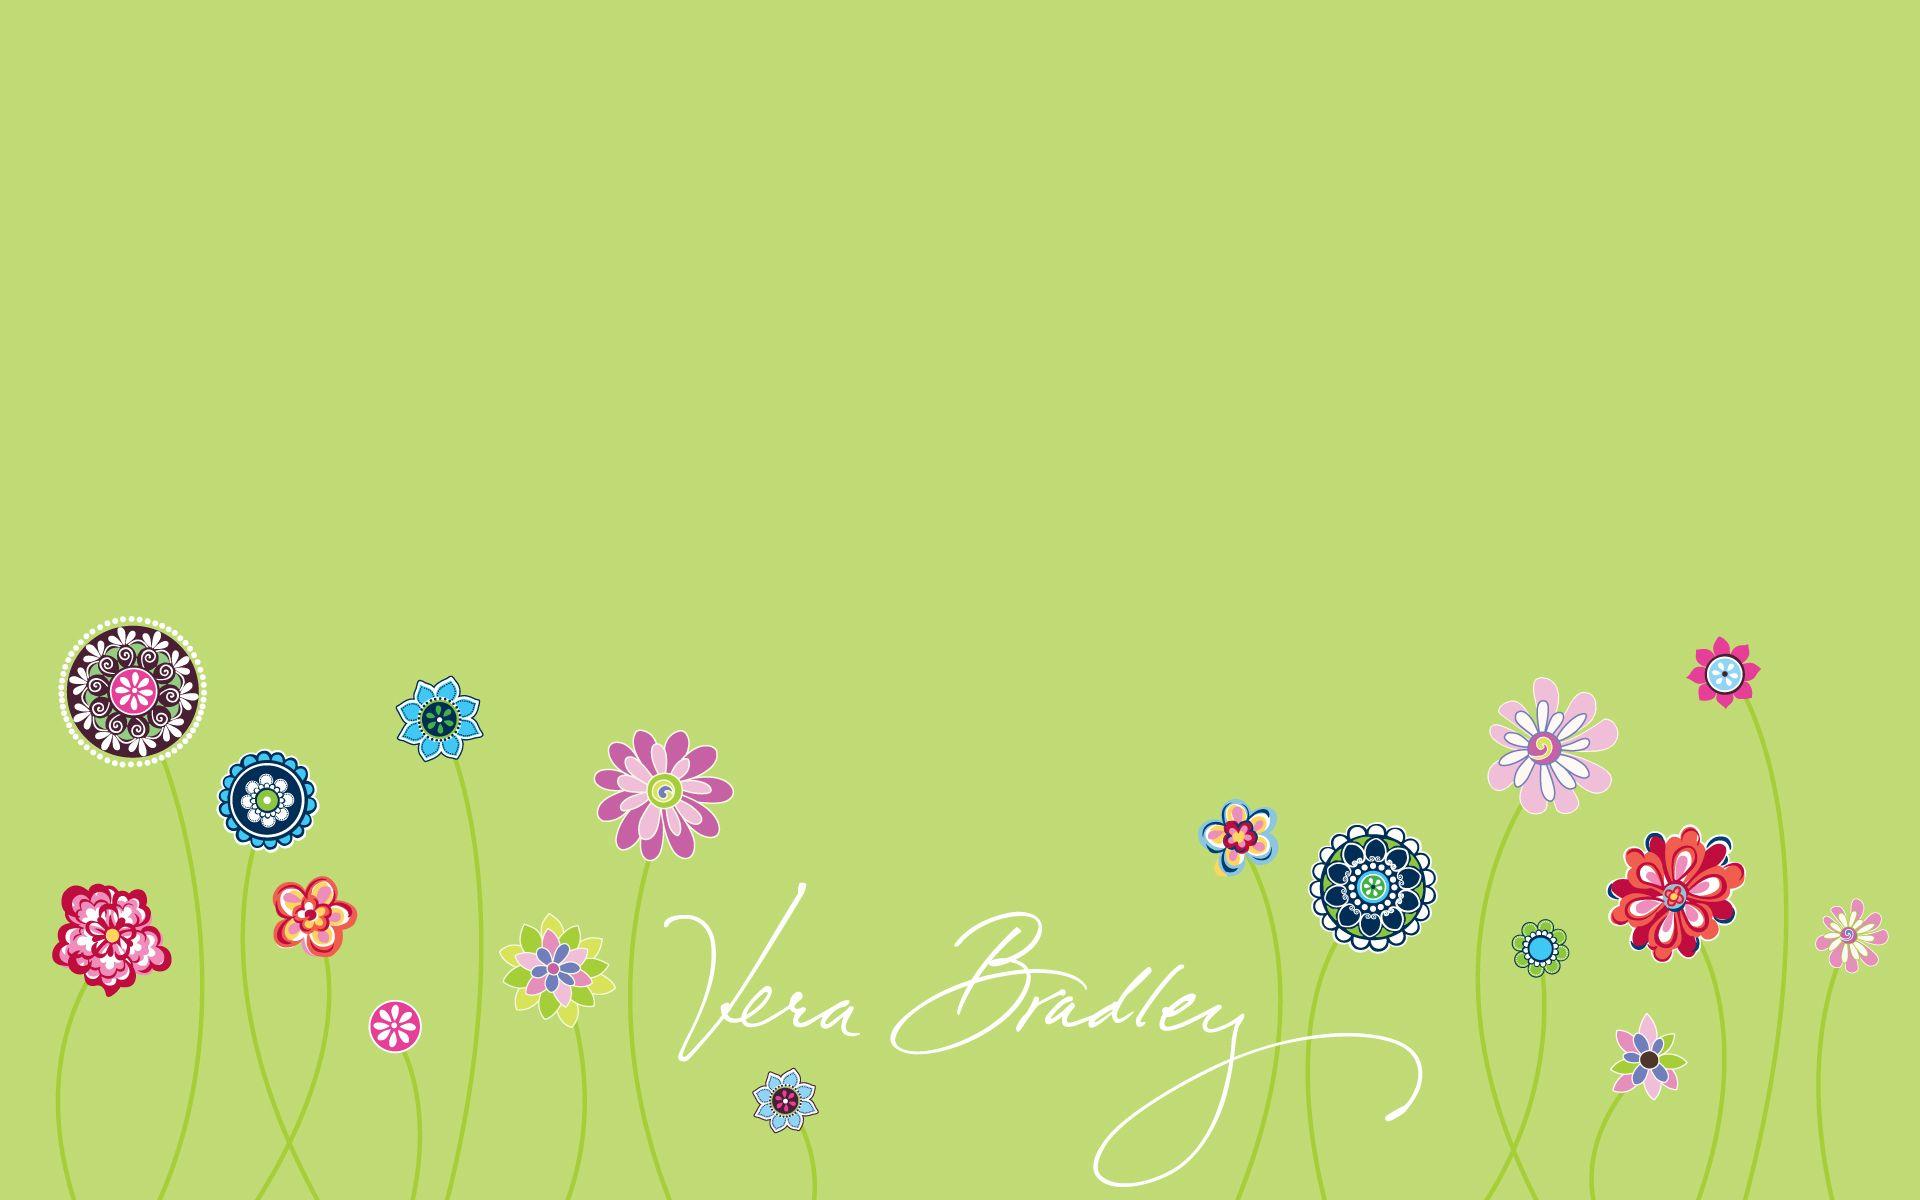 Vera Bradley Island Bloom Desktop Wallpaper | pics | Pinterest ...